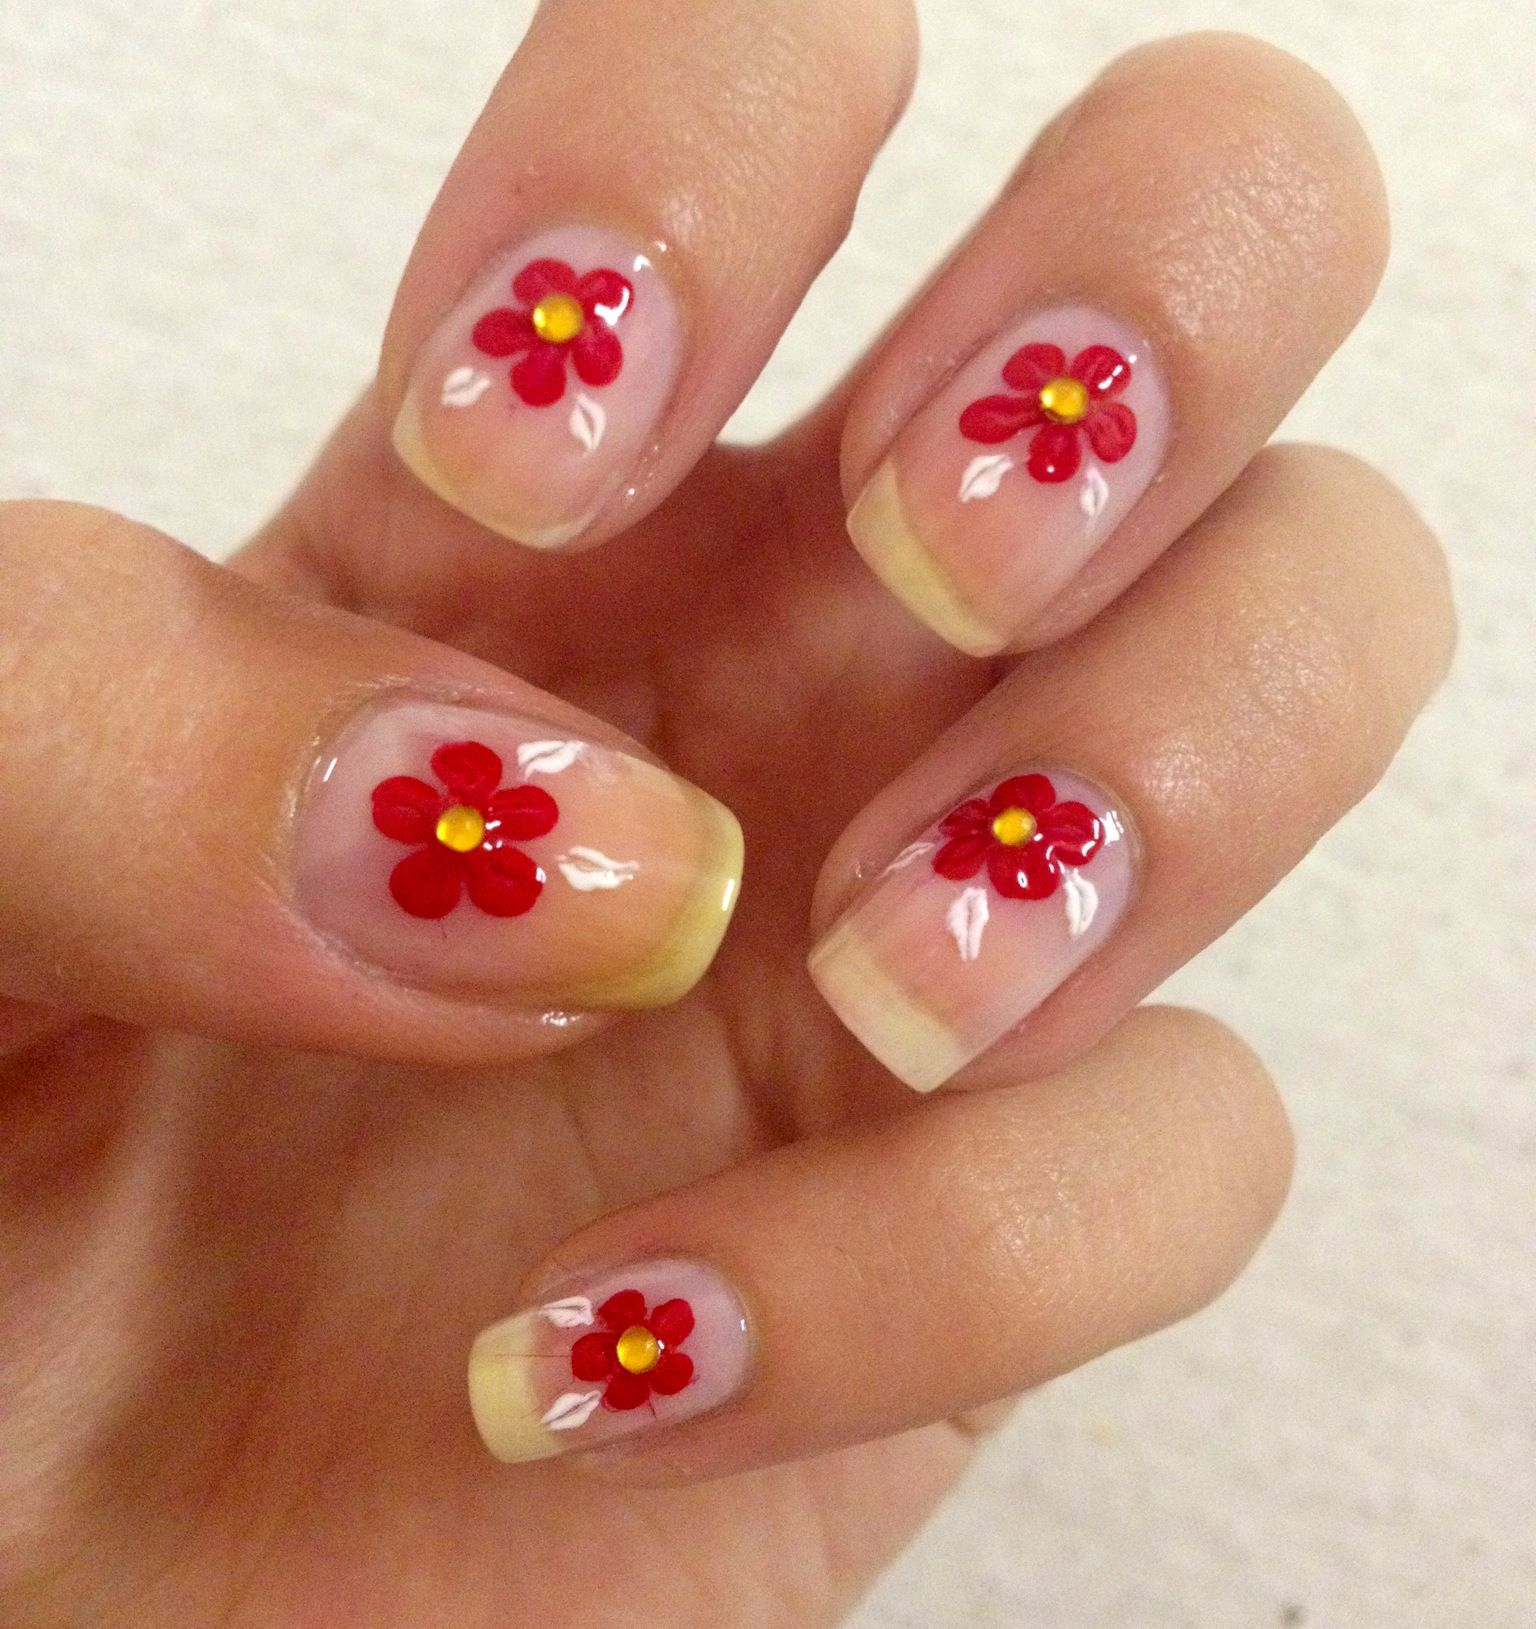 Red flowers on clear nails , short nails, nail art at home | Mari ...